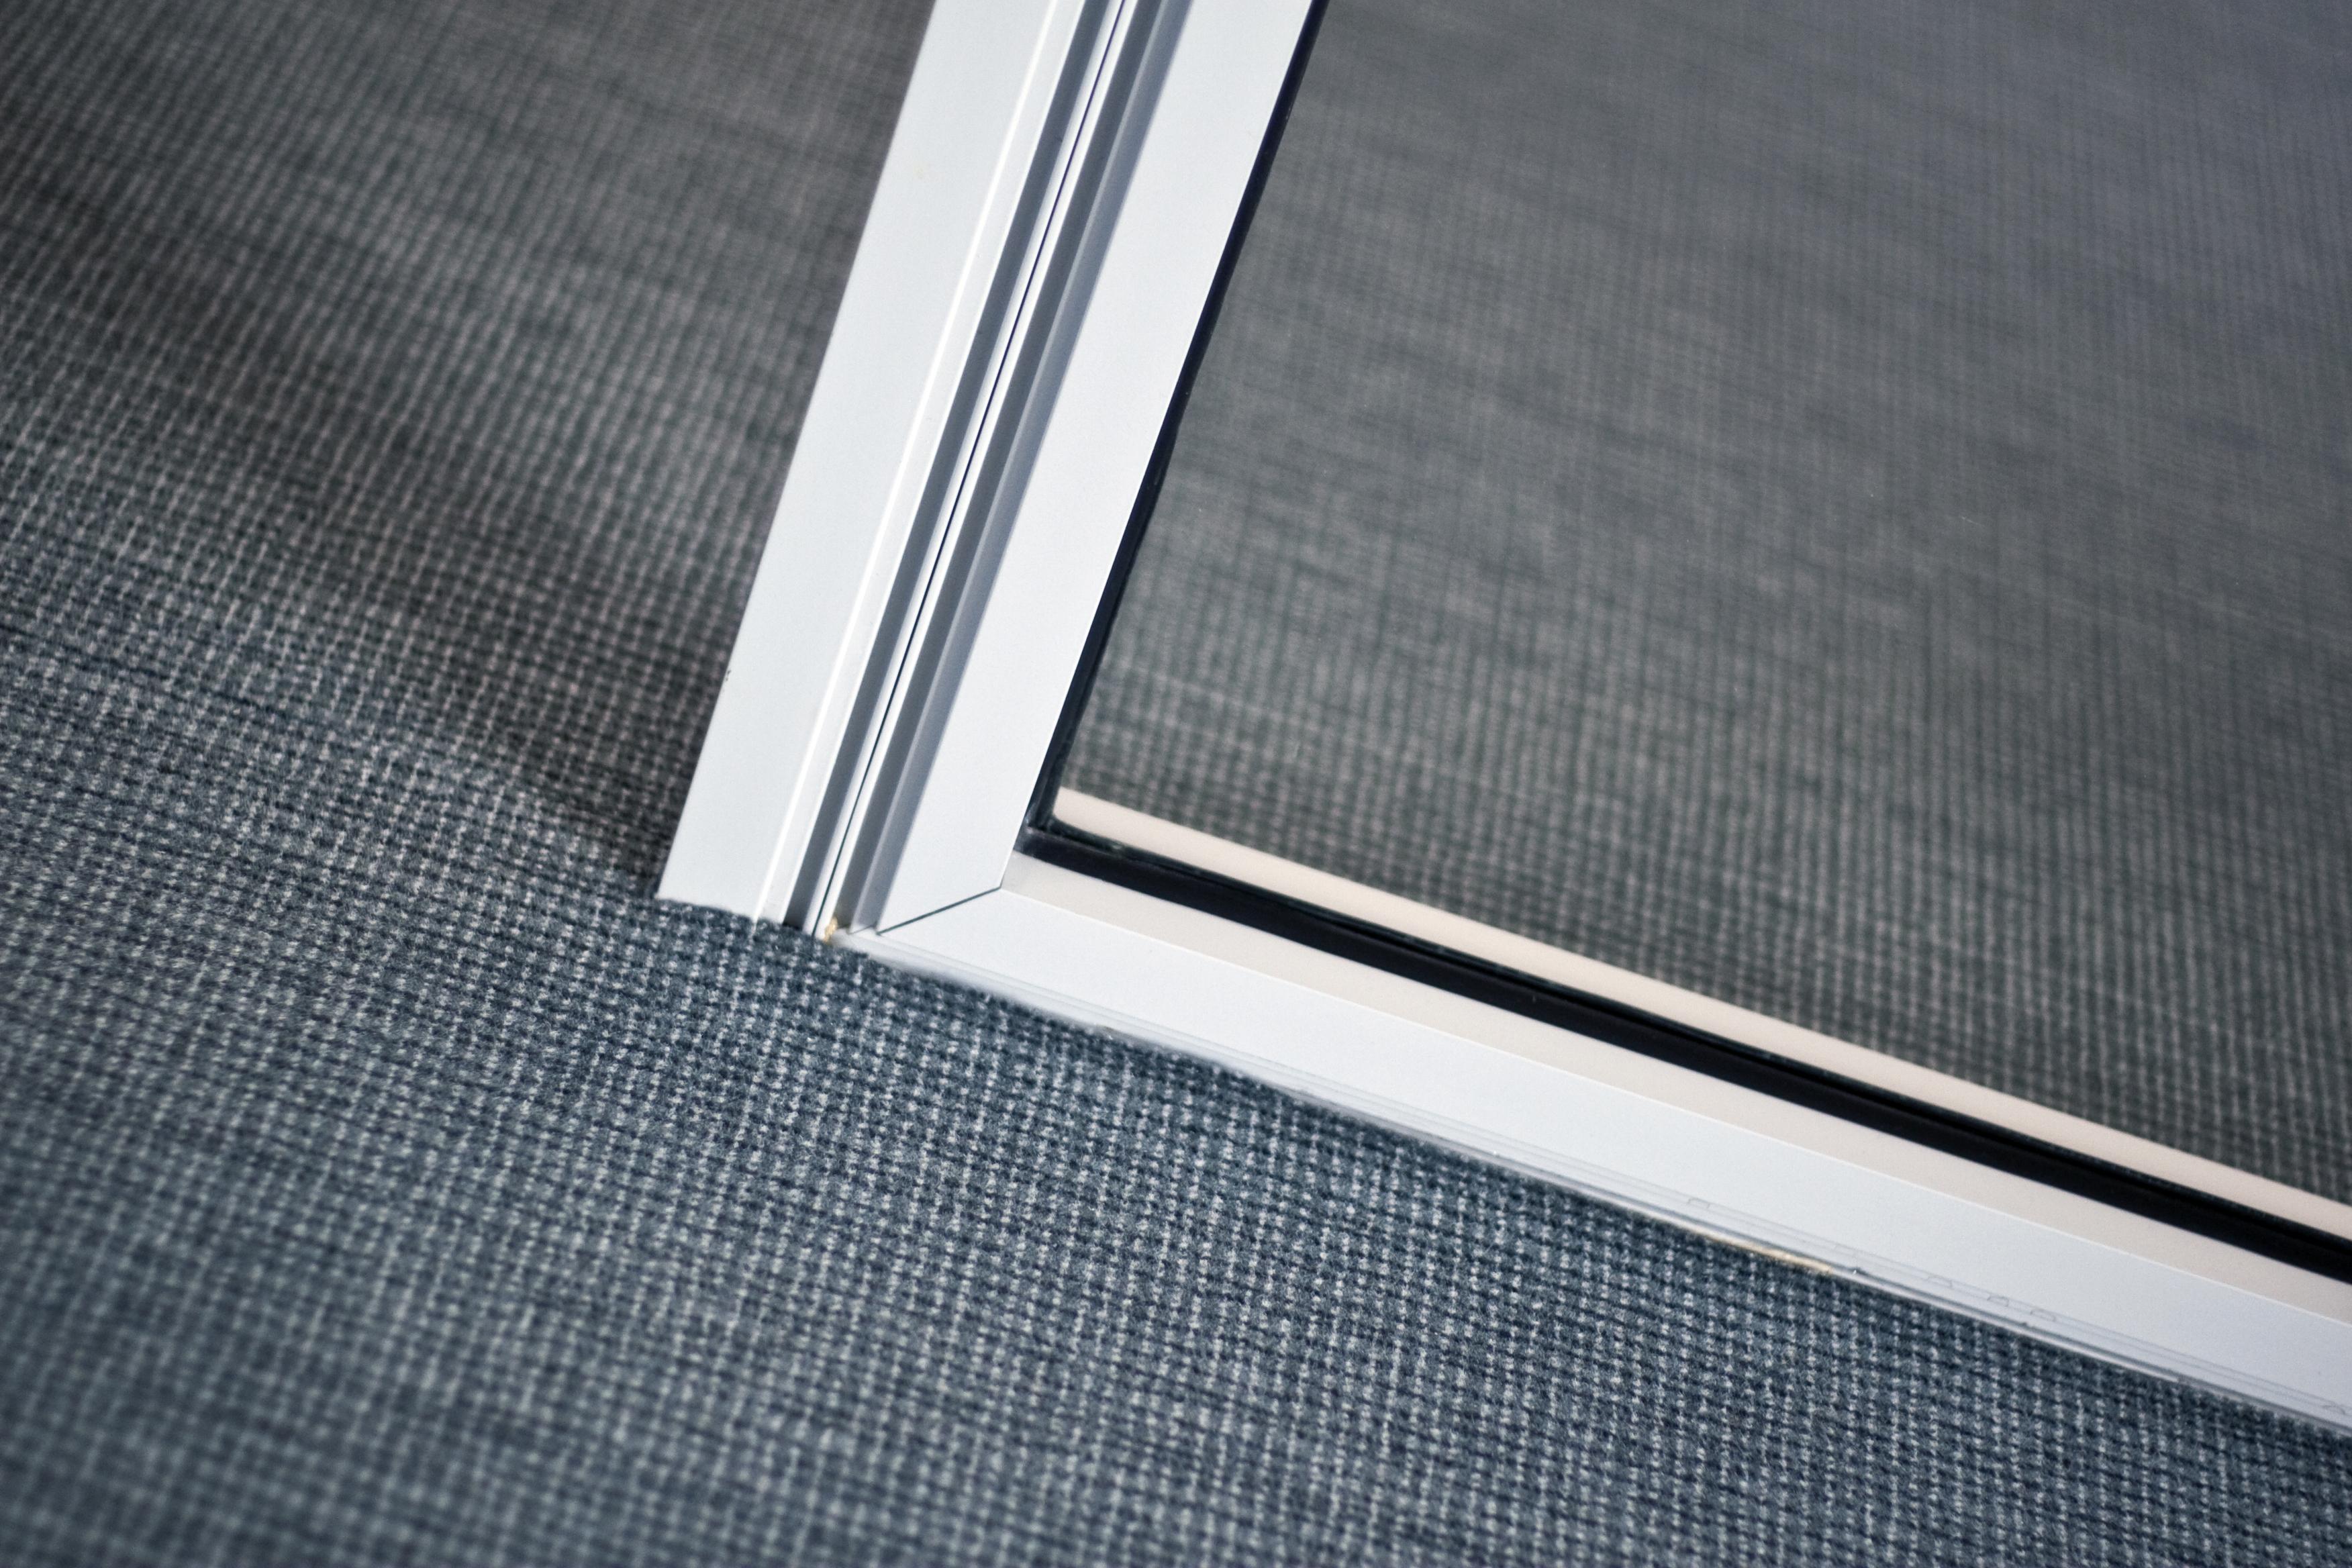 How to Fix a Hydraulic Screen Door Closer | Hunker